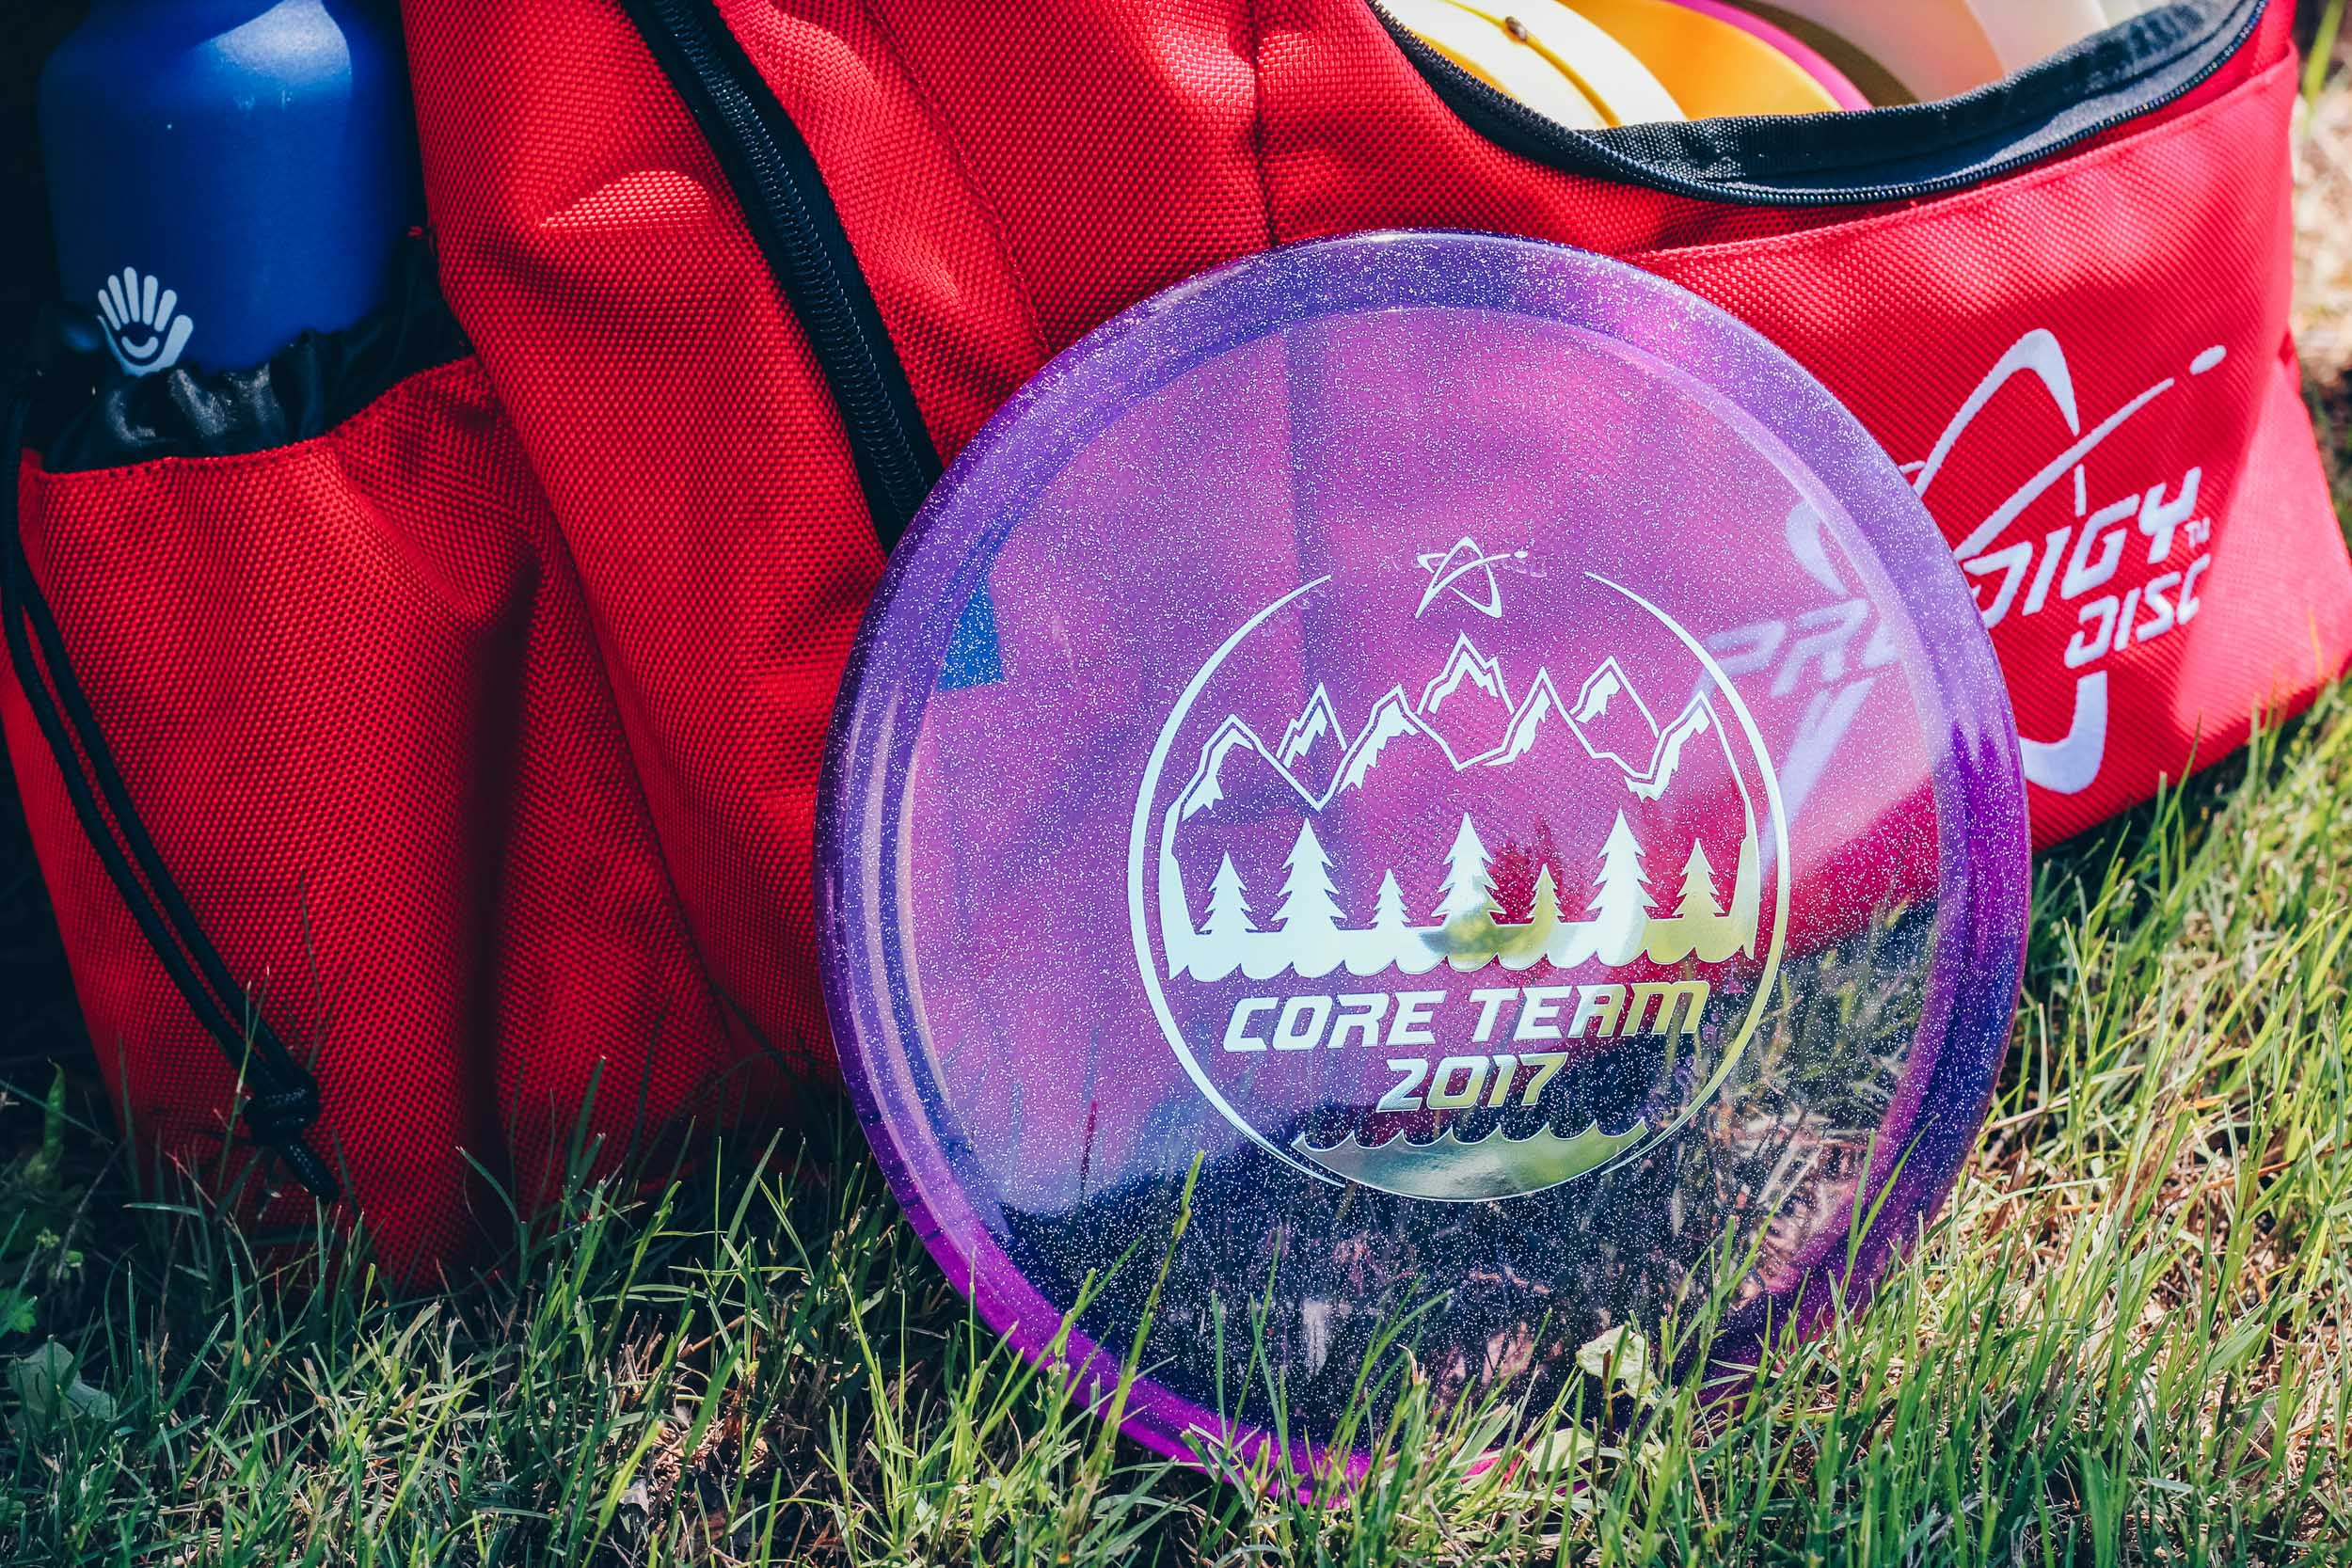 core-team-a2-glimmer-450-banner.jpg